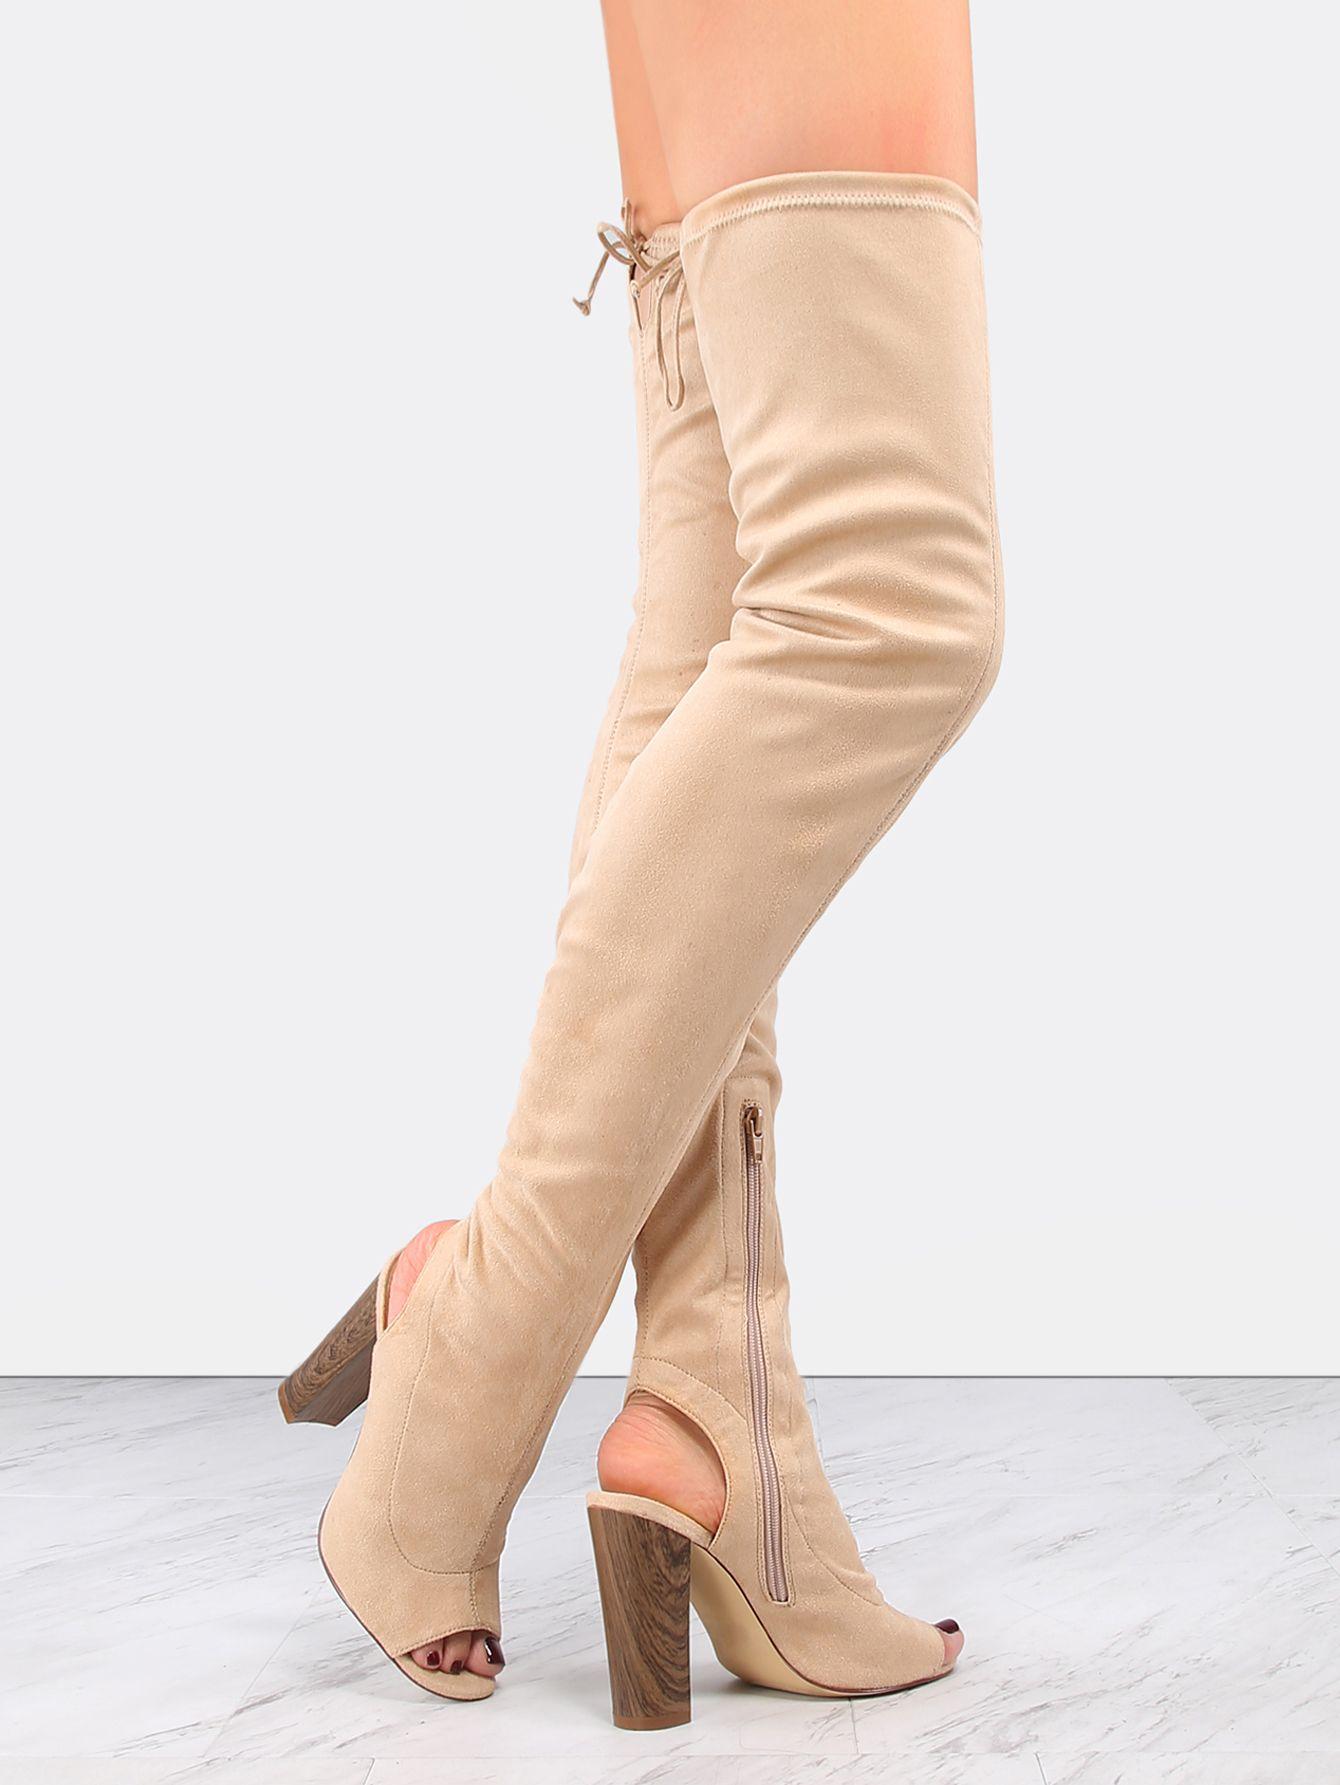 #AdoreWe #SheIn Boots - SheIn Heel Cut Out Suede Thigh Boots NUDE - AdoreWe.com